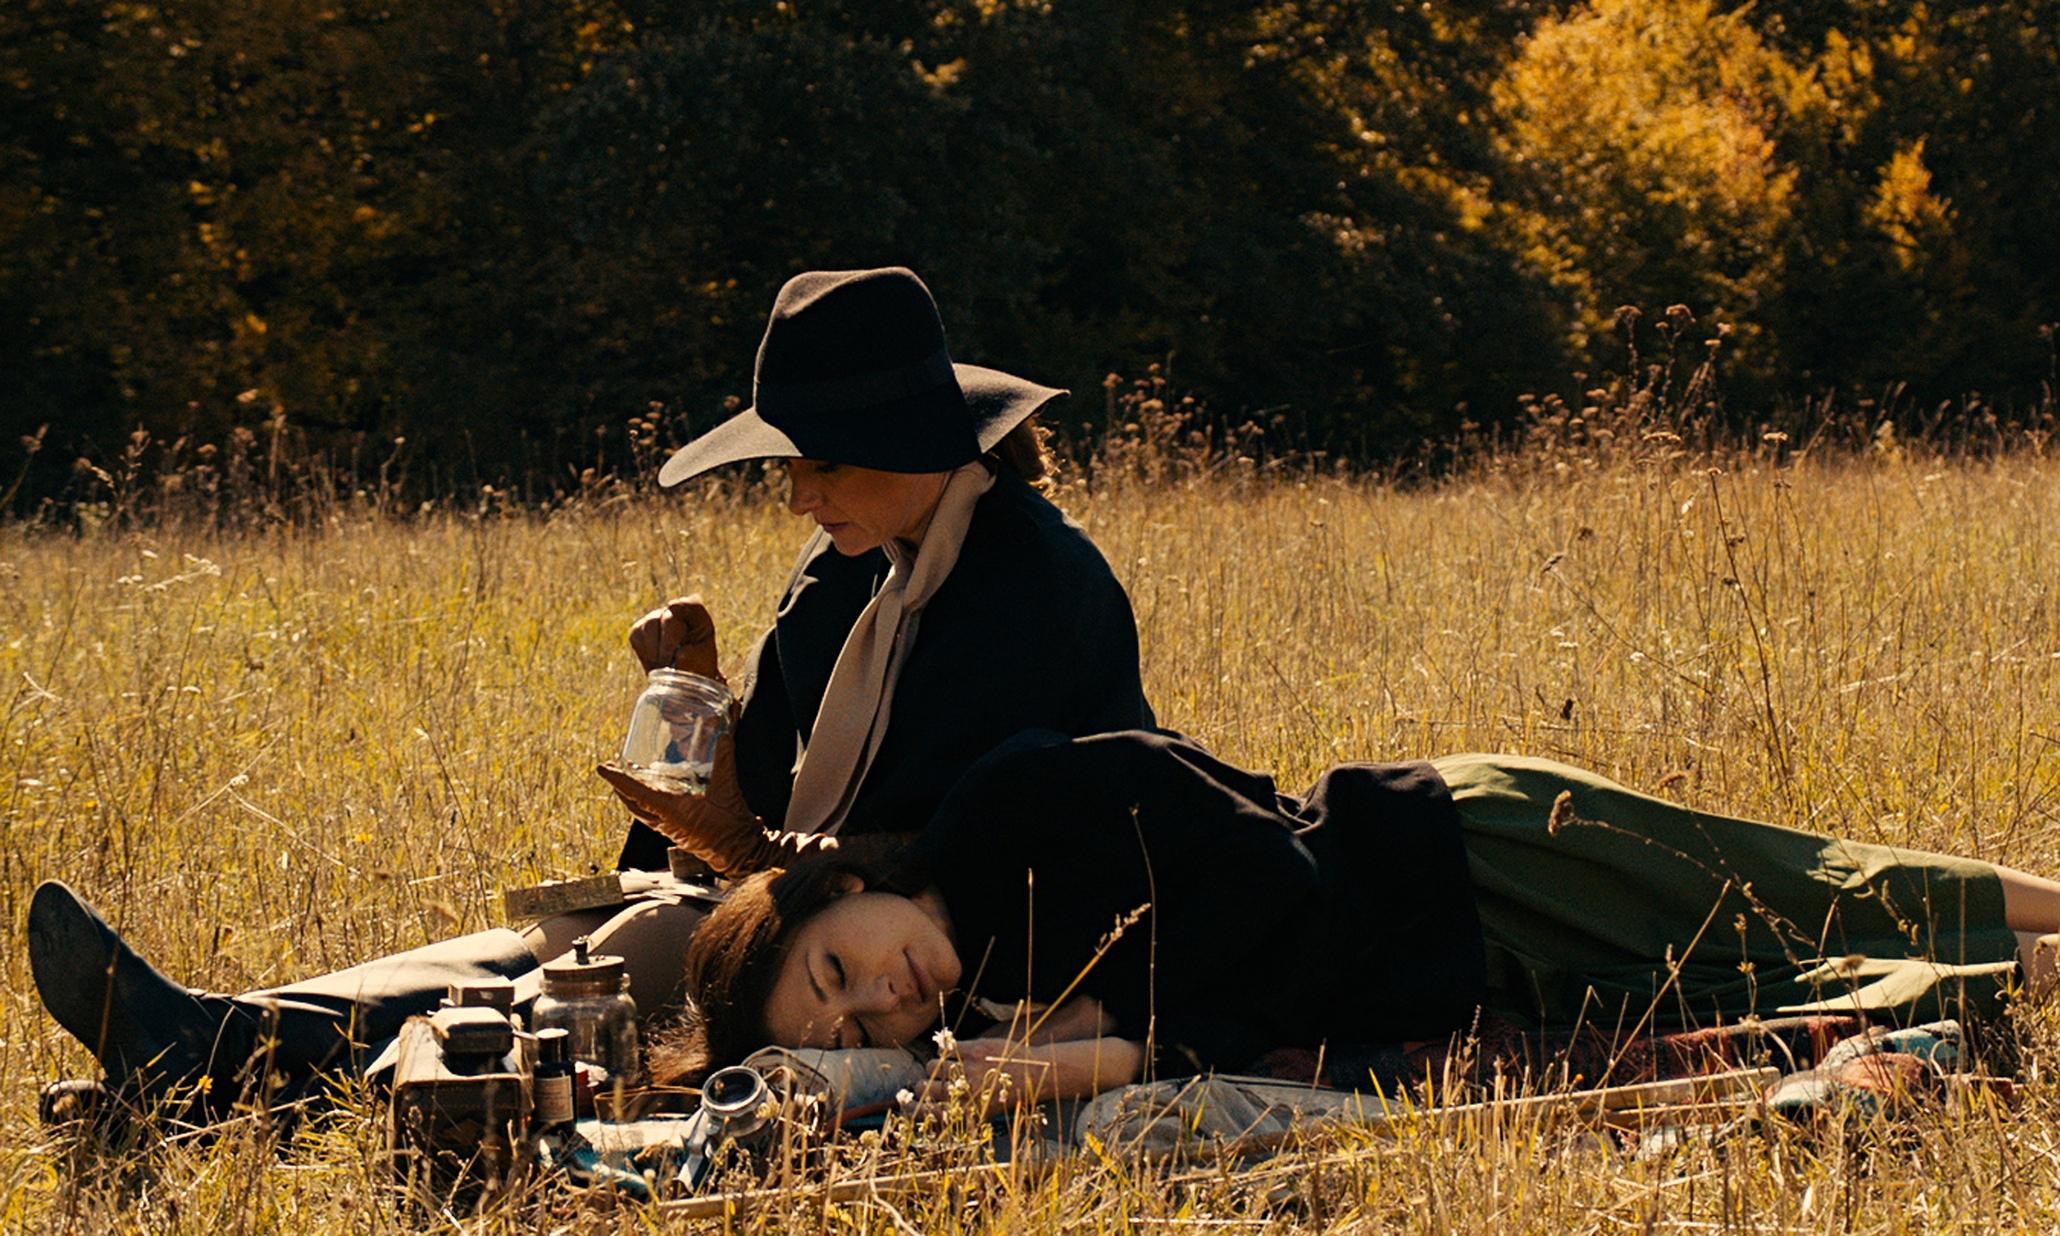 Sidse Babbett Knudsen and Chiara d'Anna ponder love and butterflies in  The Duke of Burgundy.